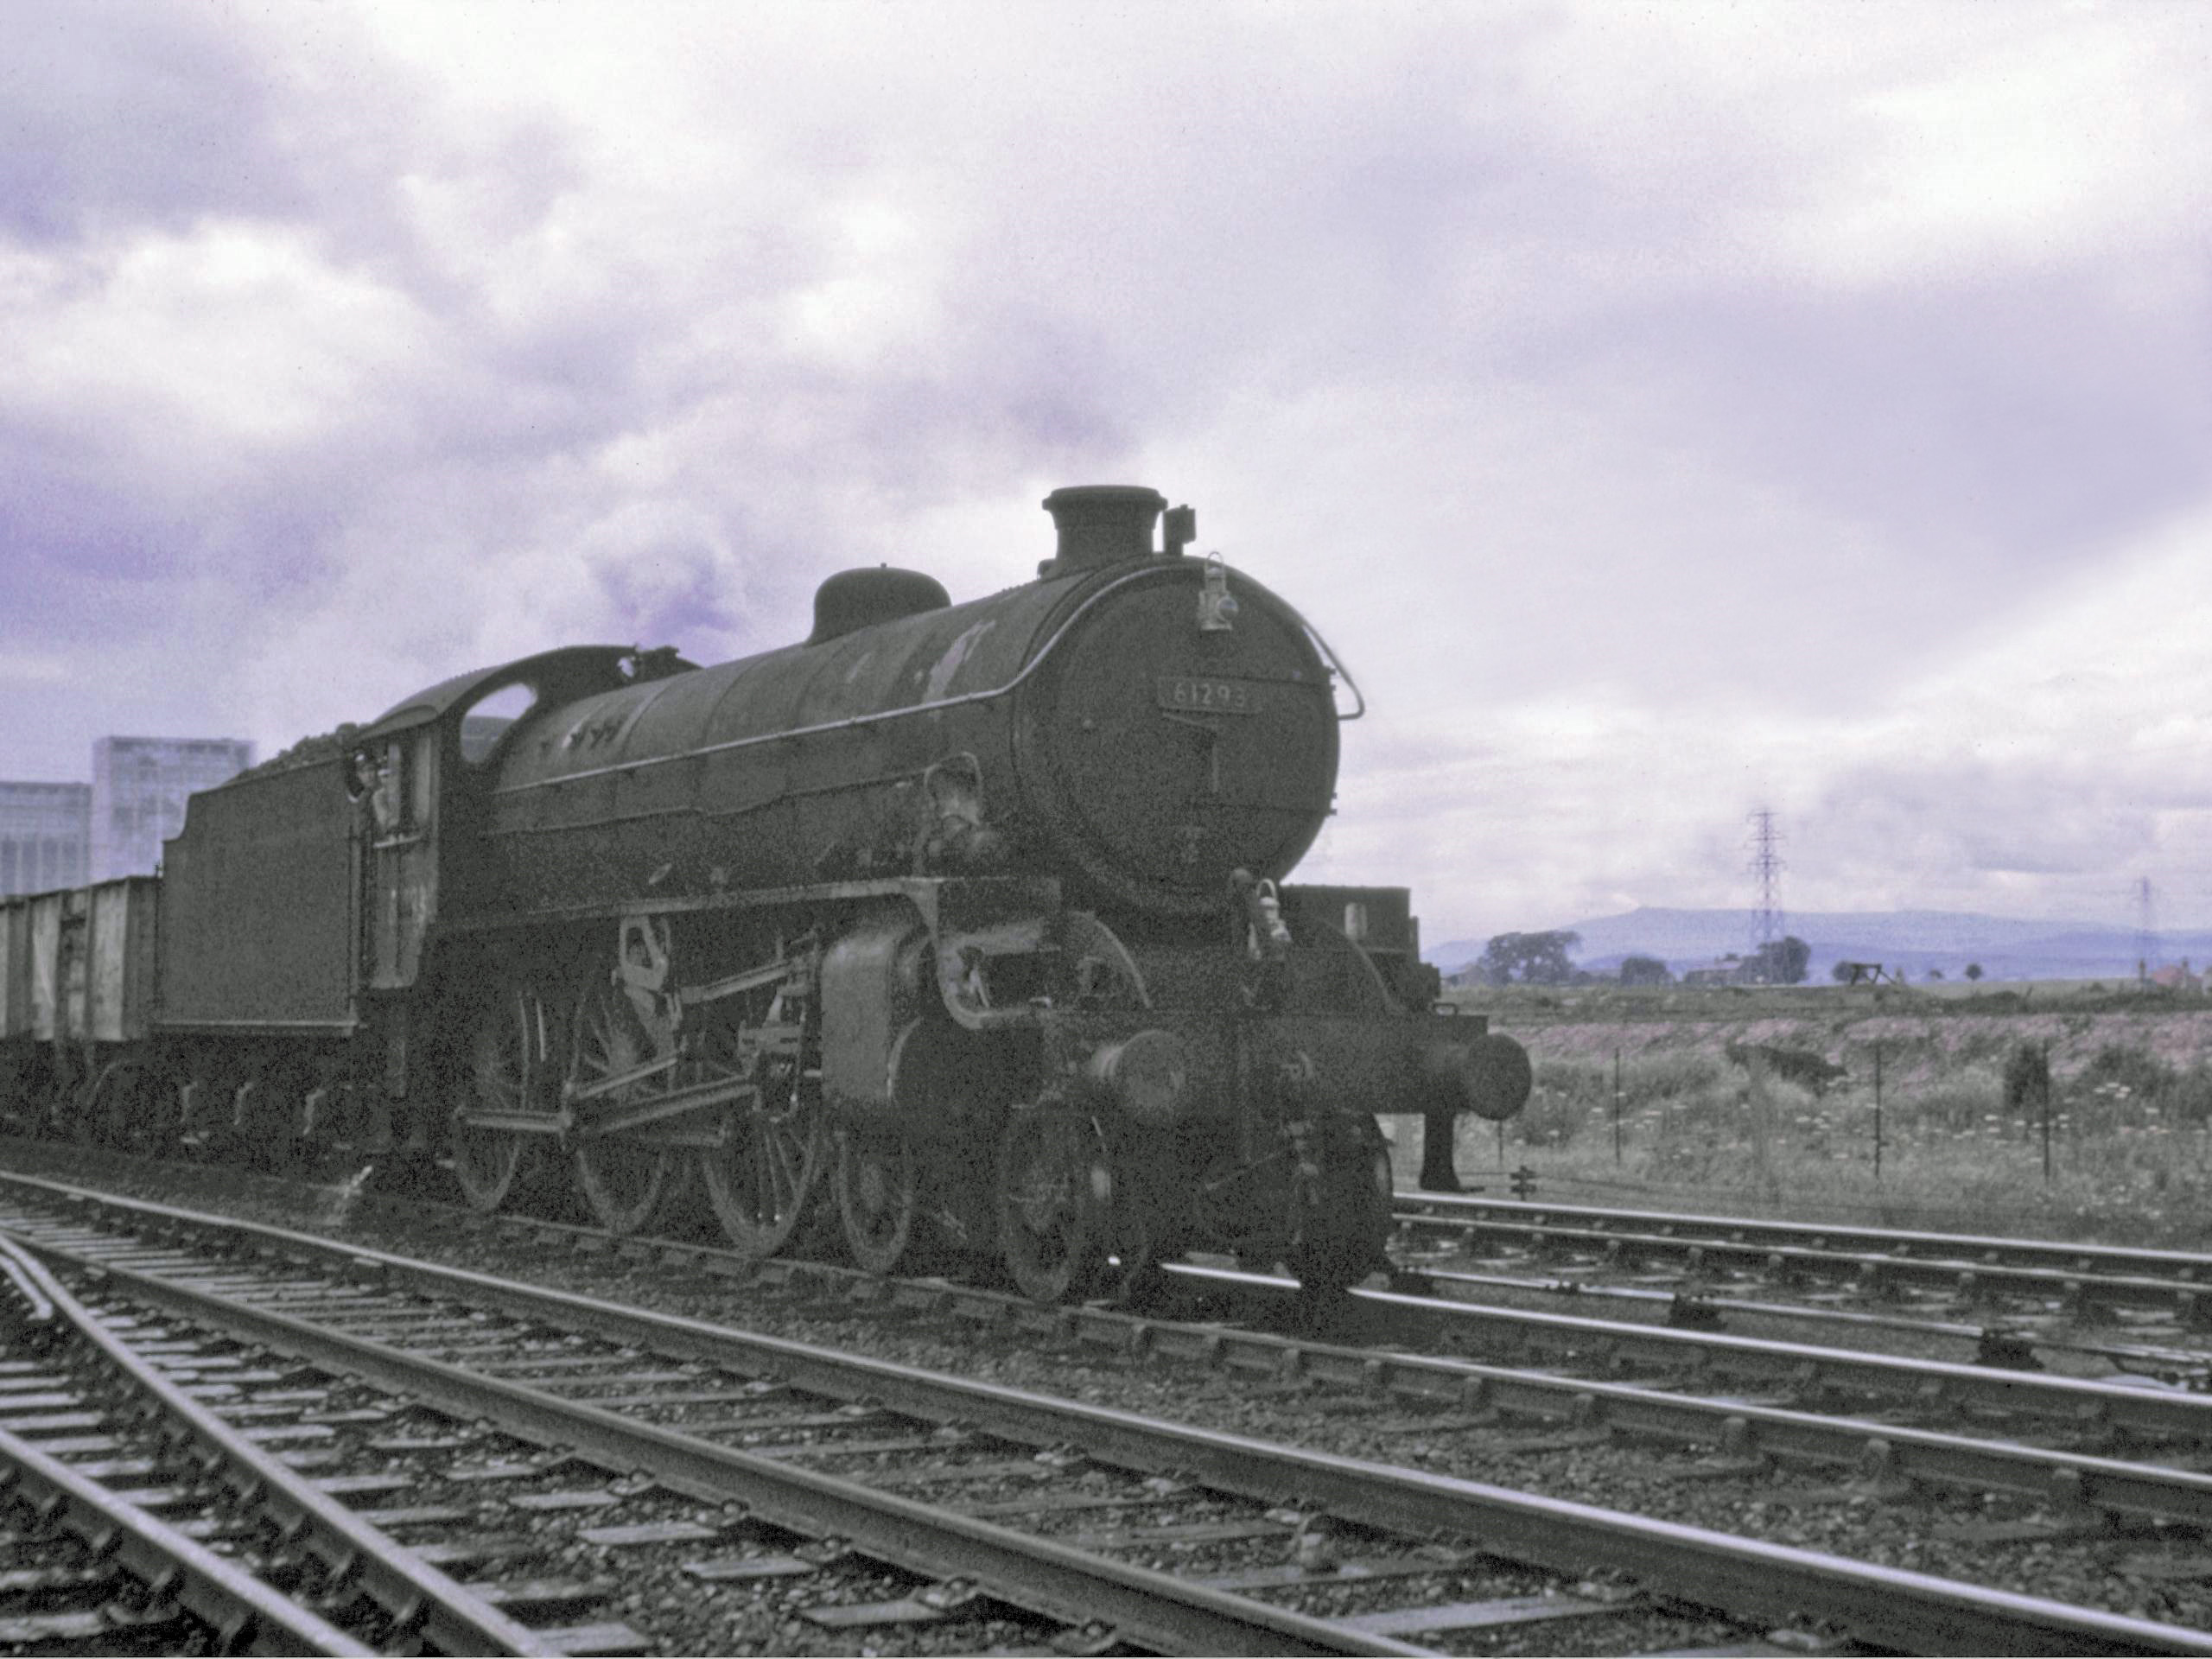 Thornton July on Steam Locomotive Valve Gear